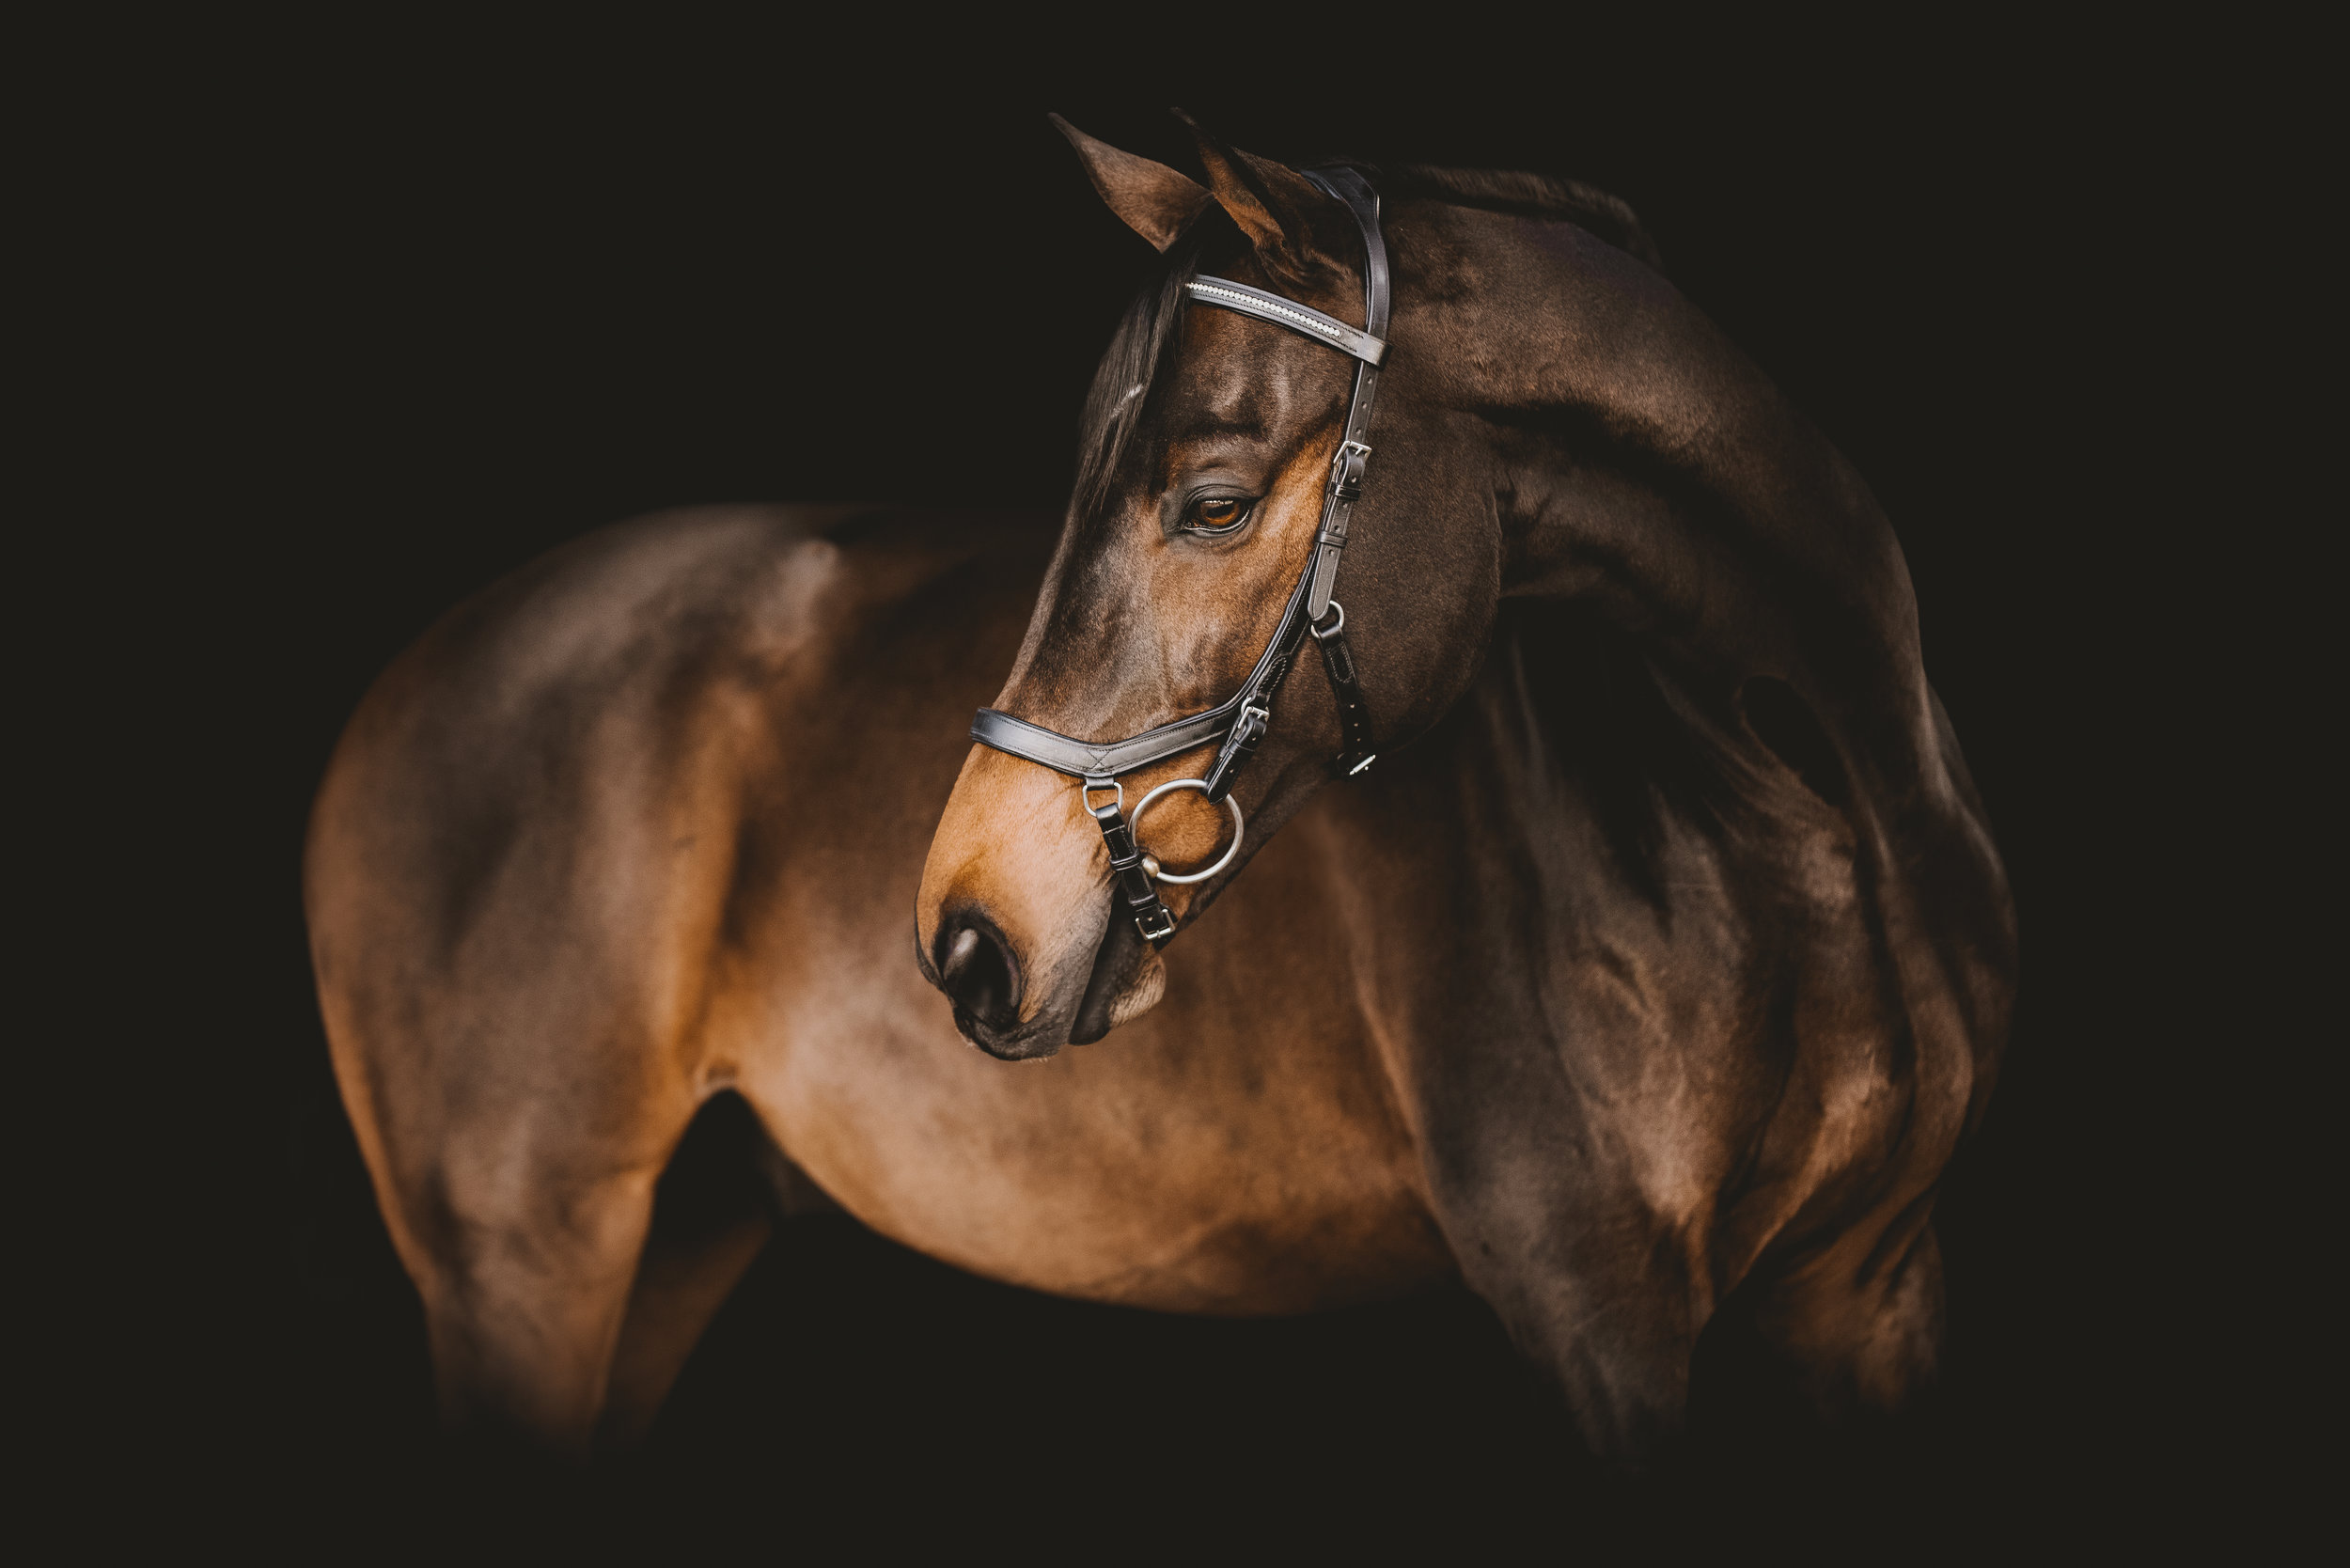 Black Background Pricing Giana Terranova Photography